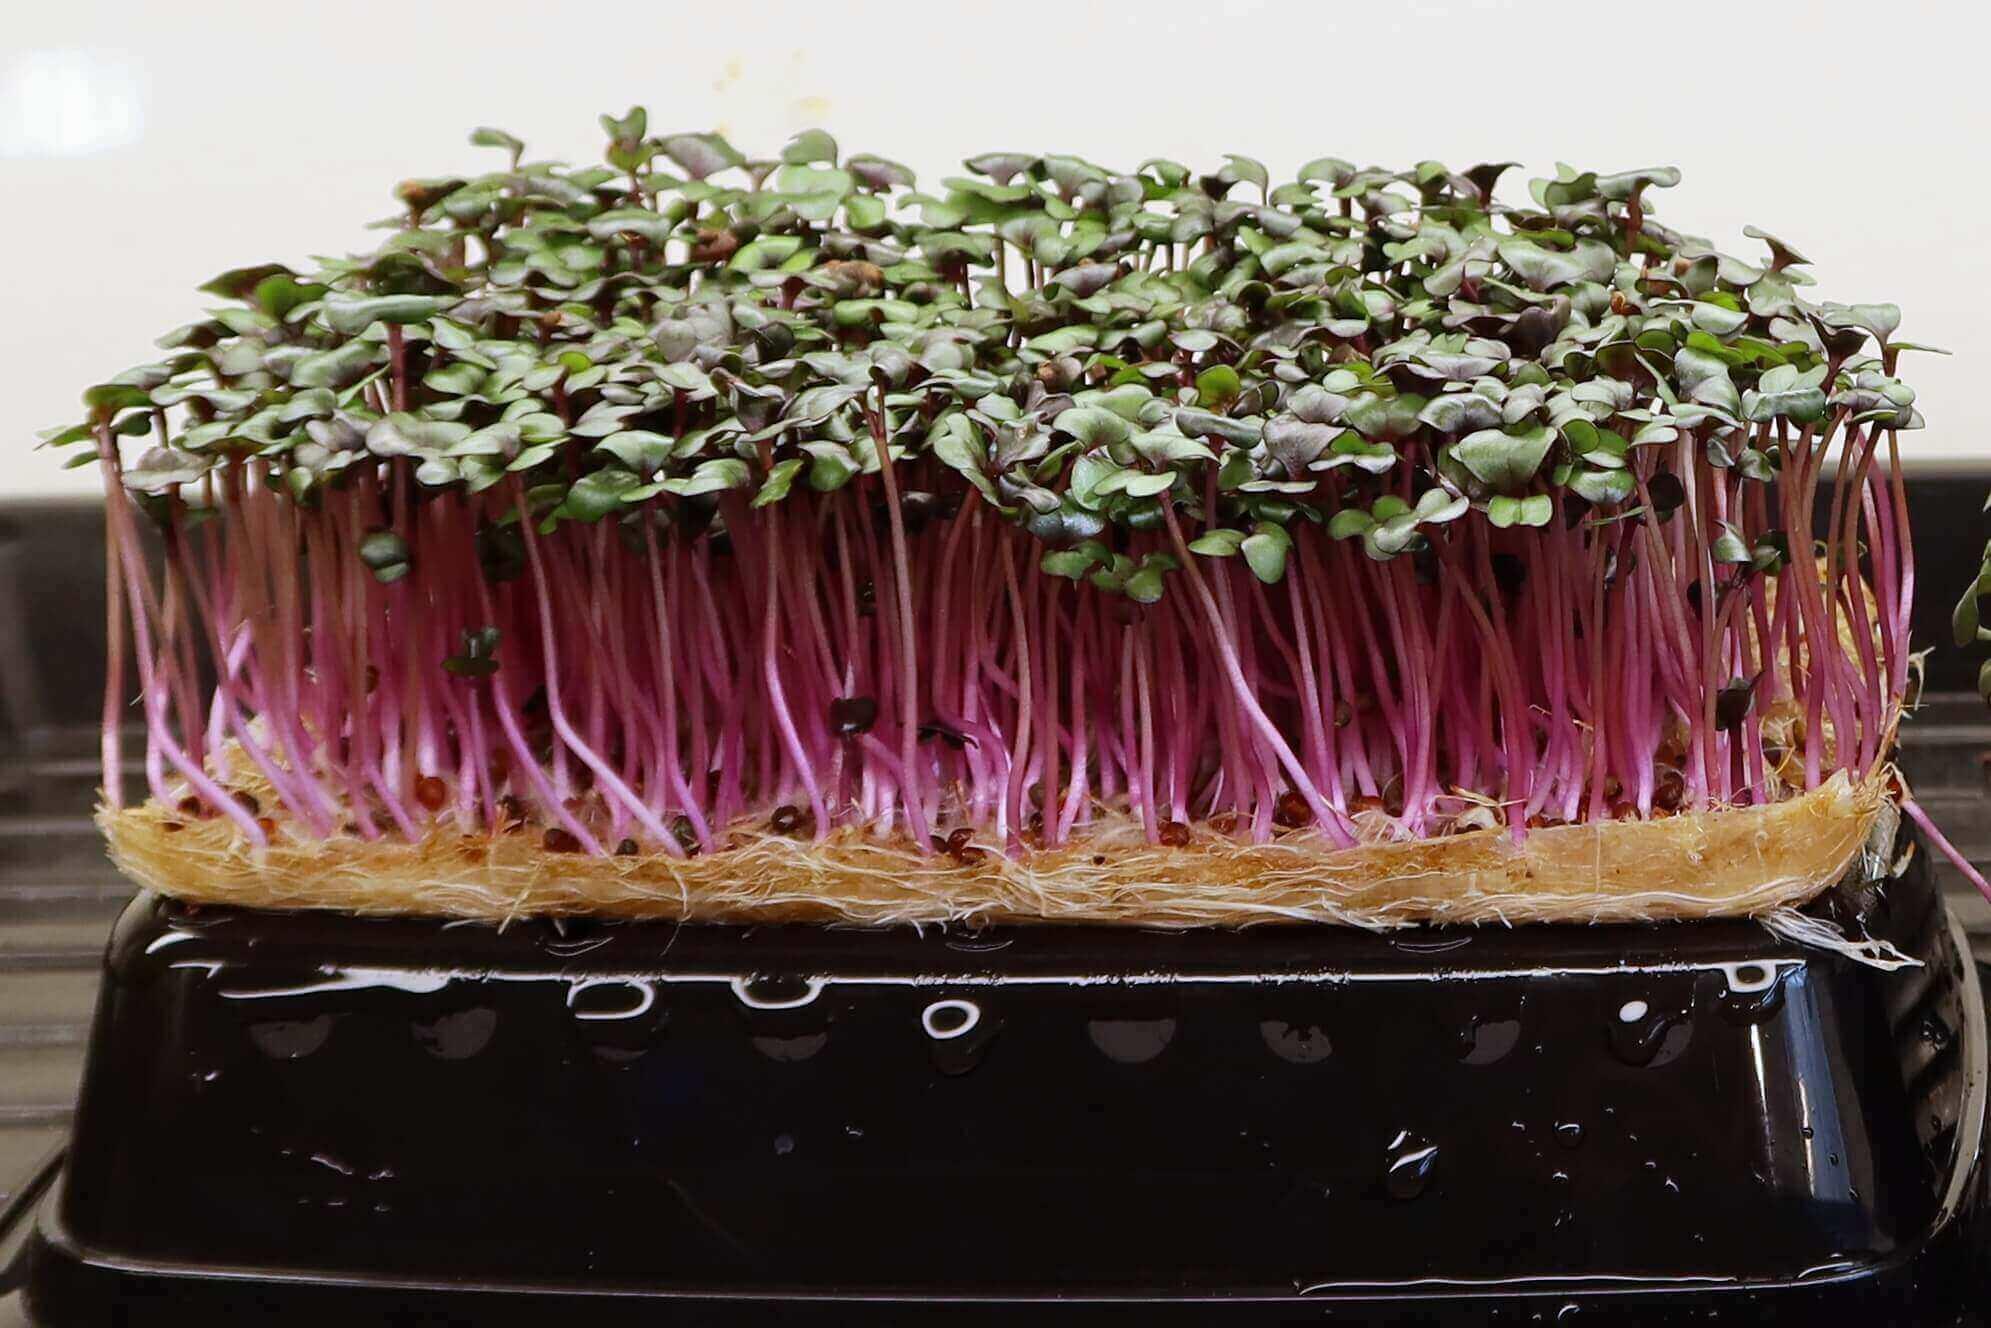 terrafibre-grow-mat-for-microgreens